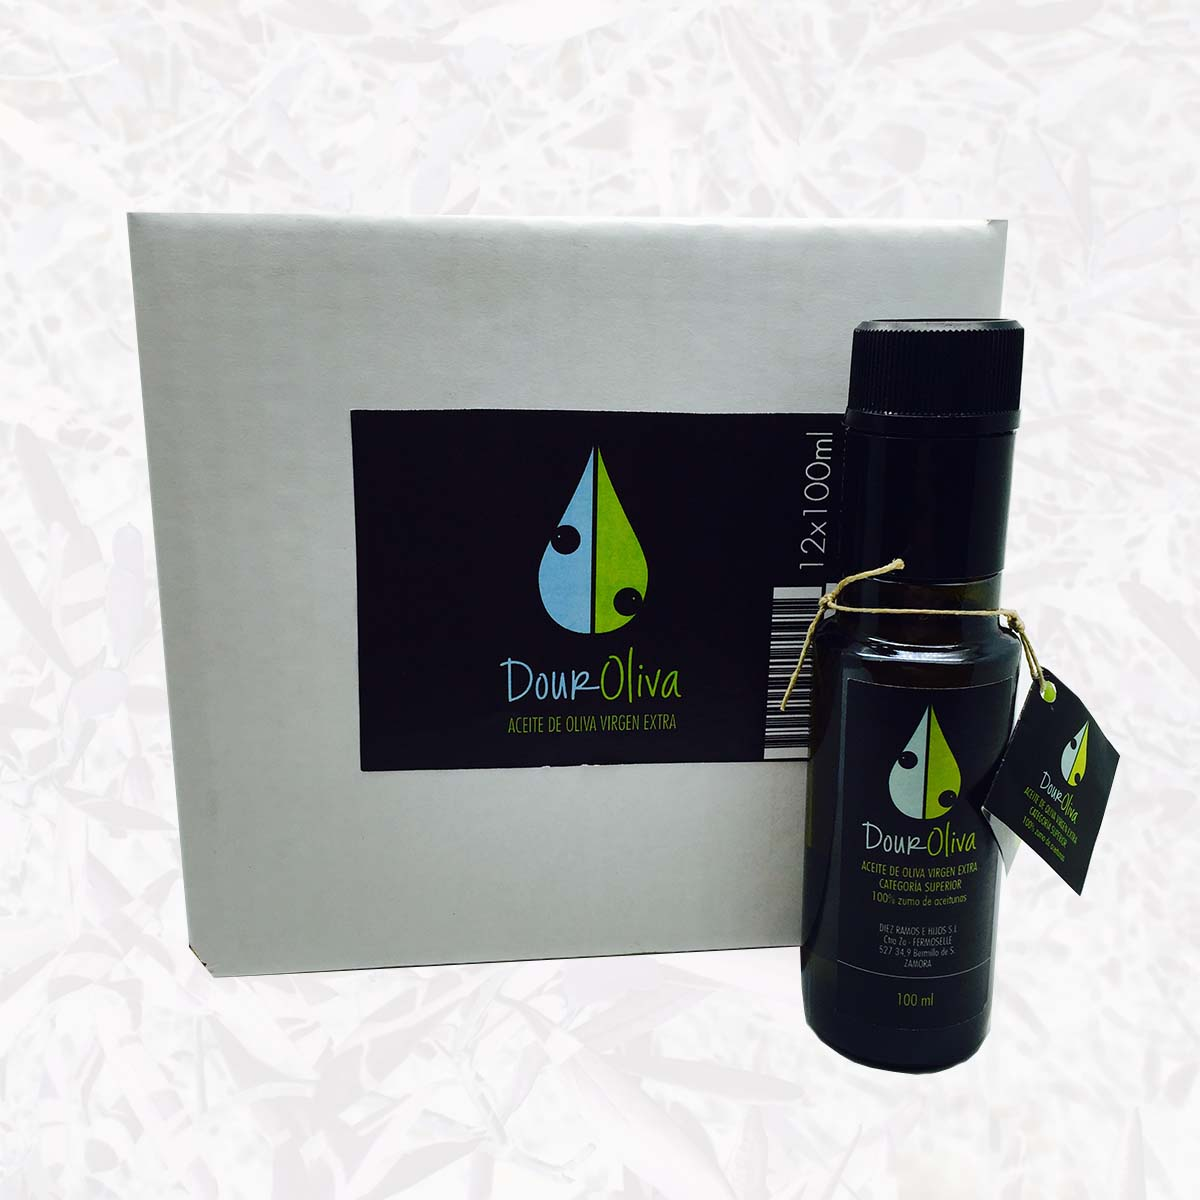 productos-douroliva-aceite-100-caja